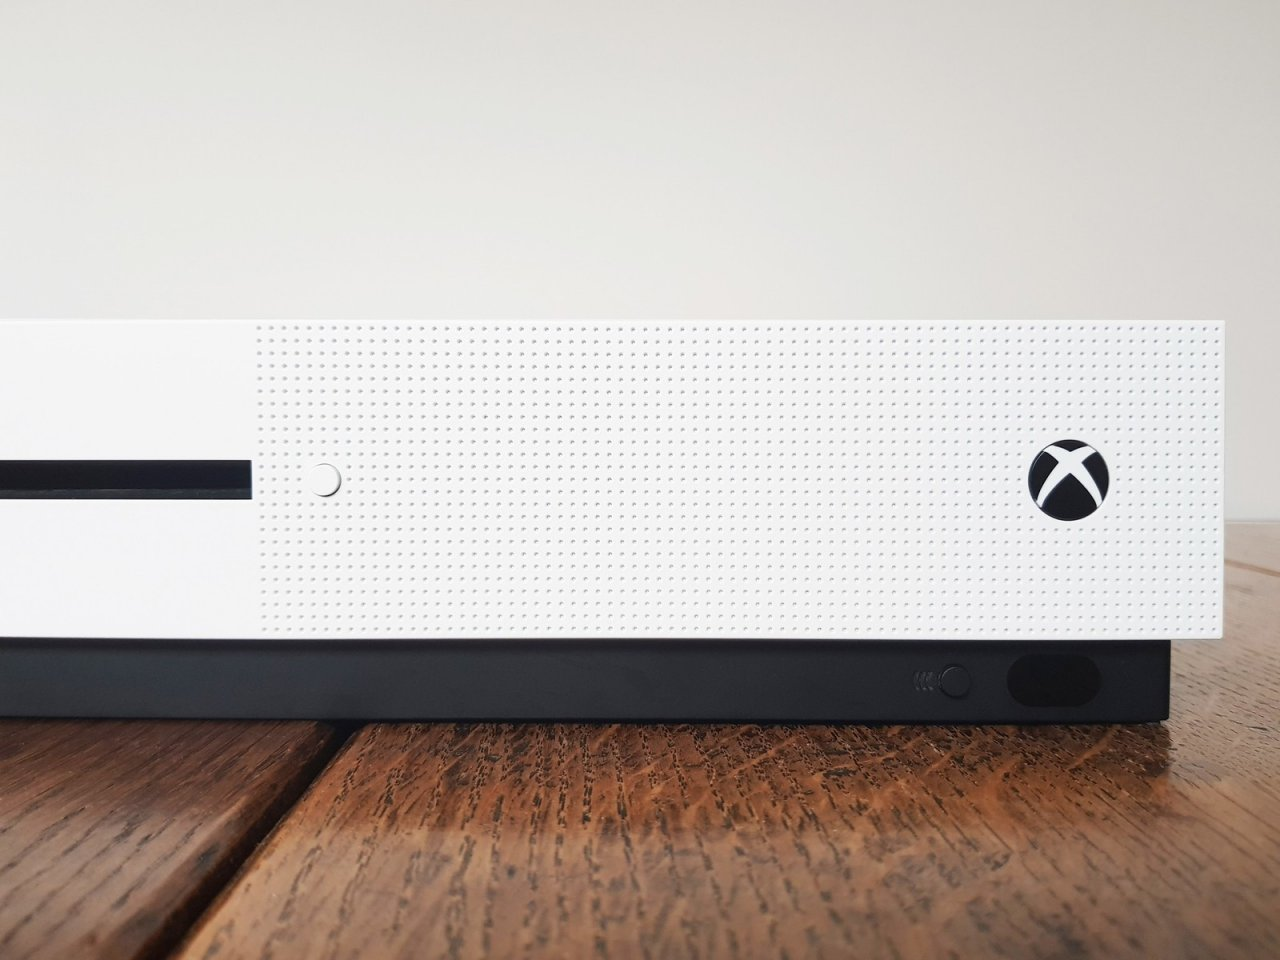 Xbox Cloud Gaming станет доступен на Xbox One и Xbox Series XS в конце этого года